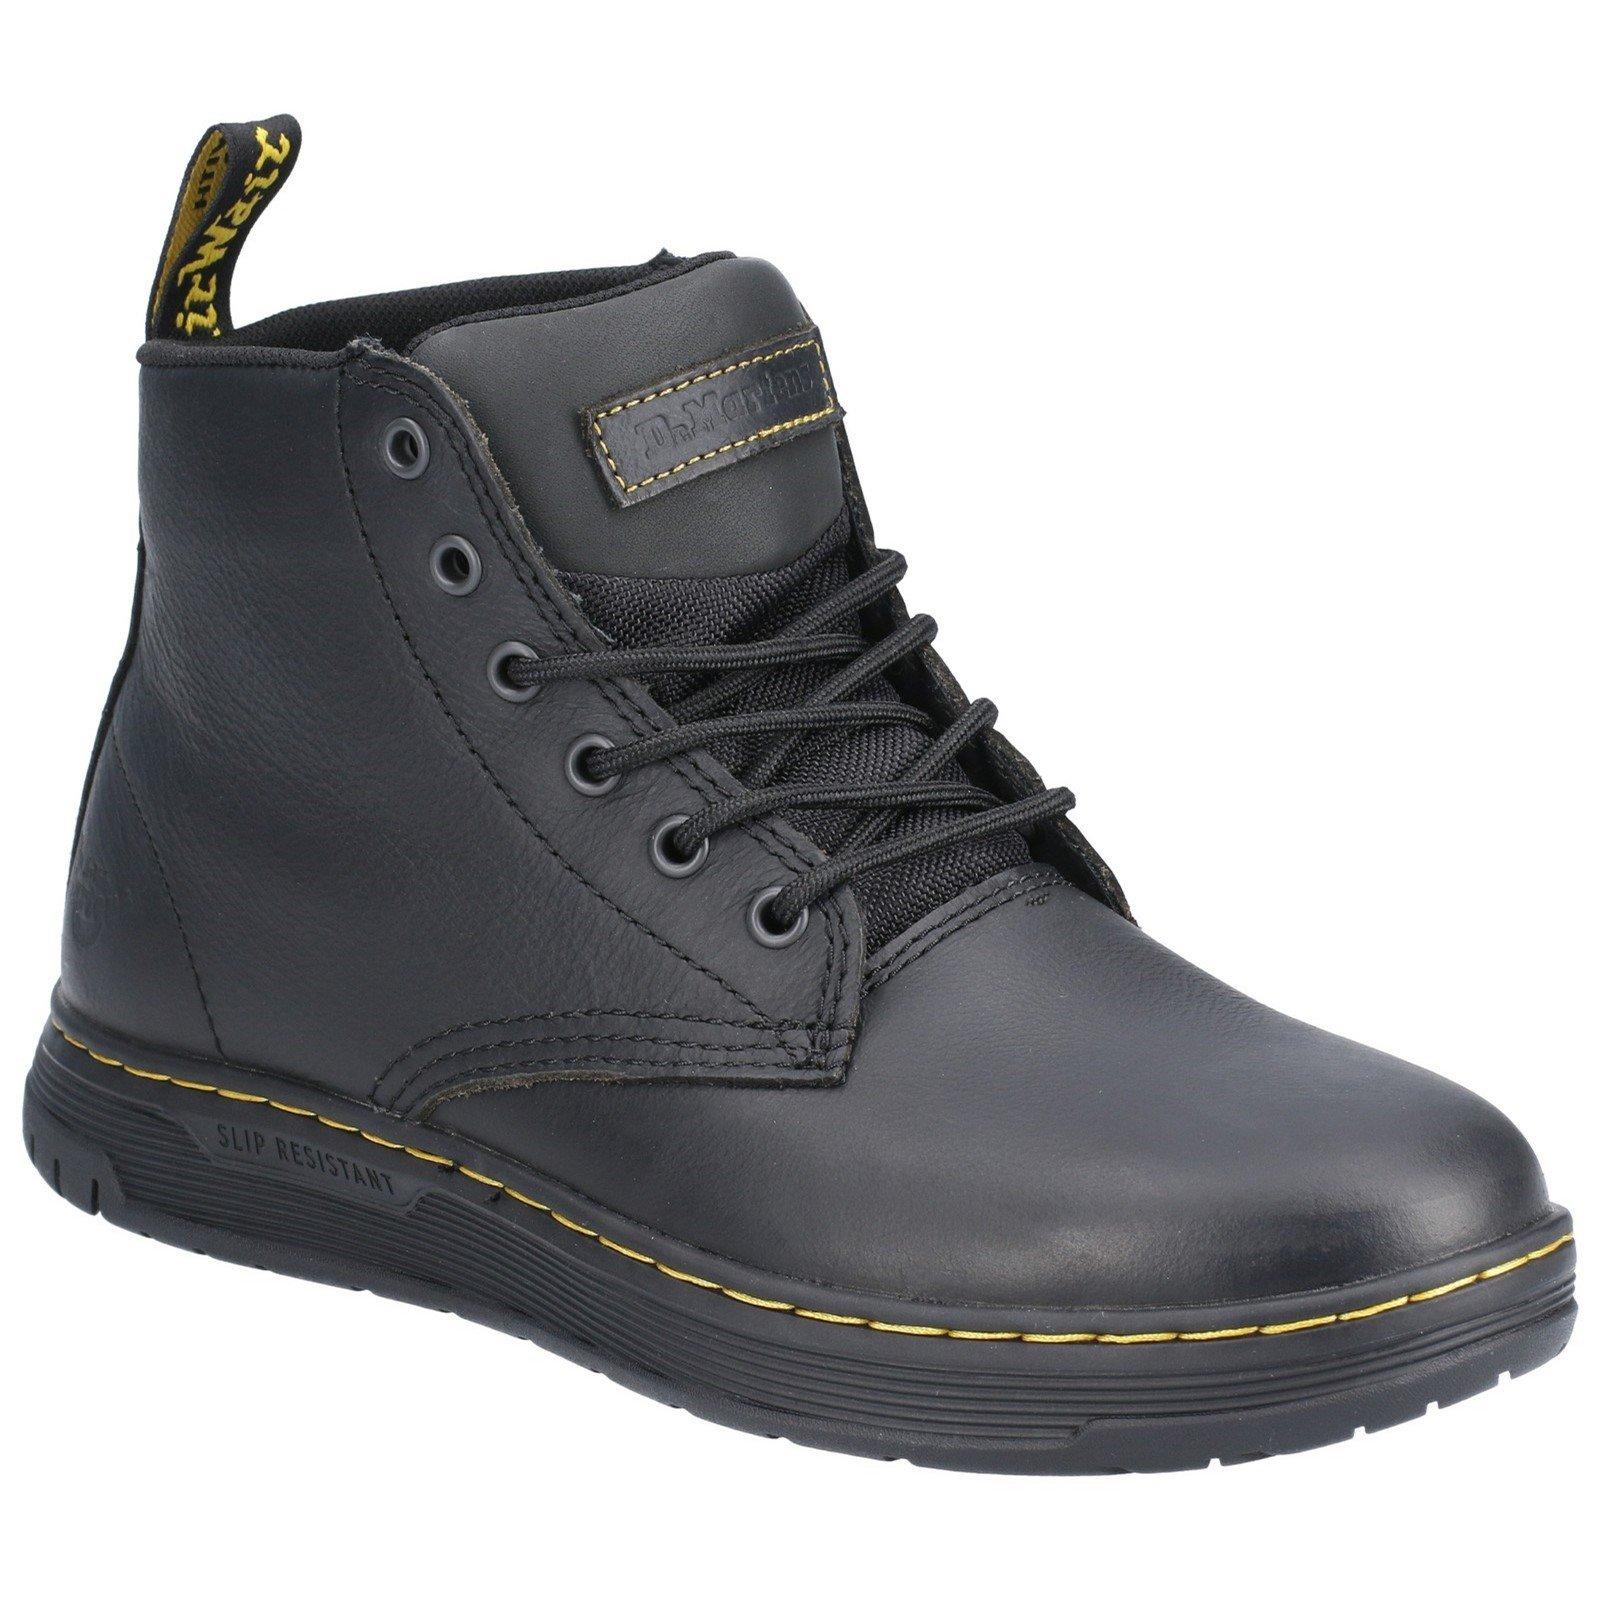 Dr Martens Men's Amwell Slip Resistant Leather Boot Black 29508 - Black 4